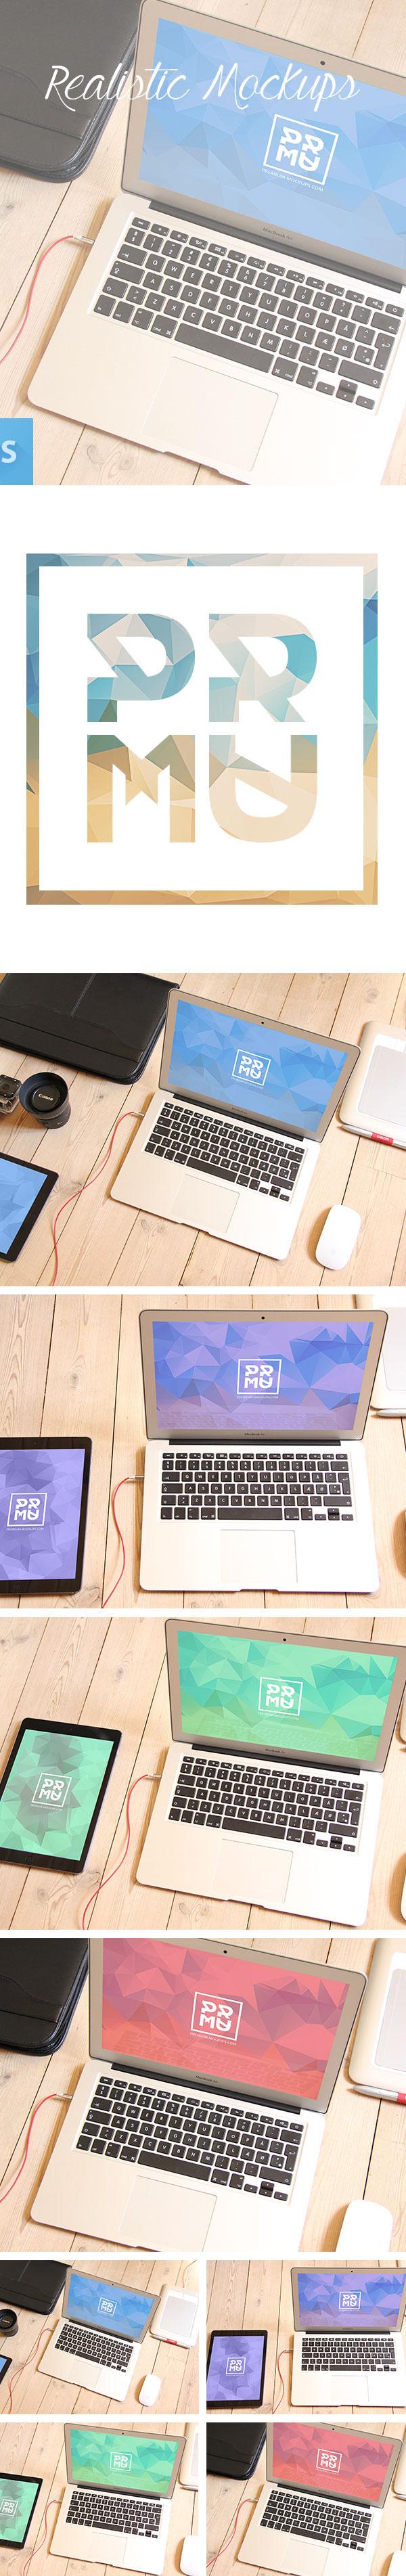 iPad mac macbook Mockup free psd download Hero apple Webdesign mock up Quality